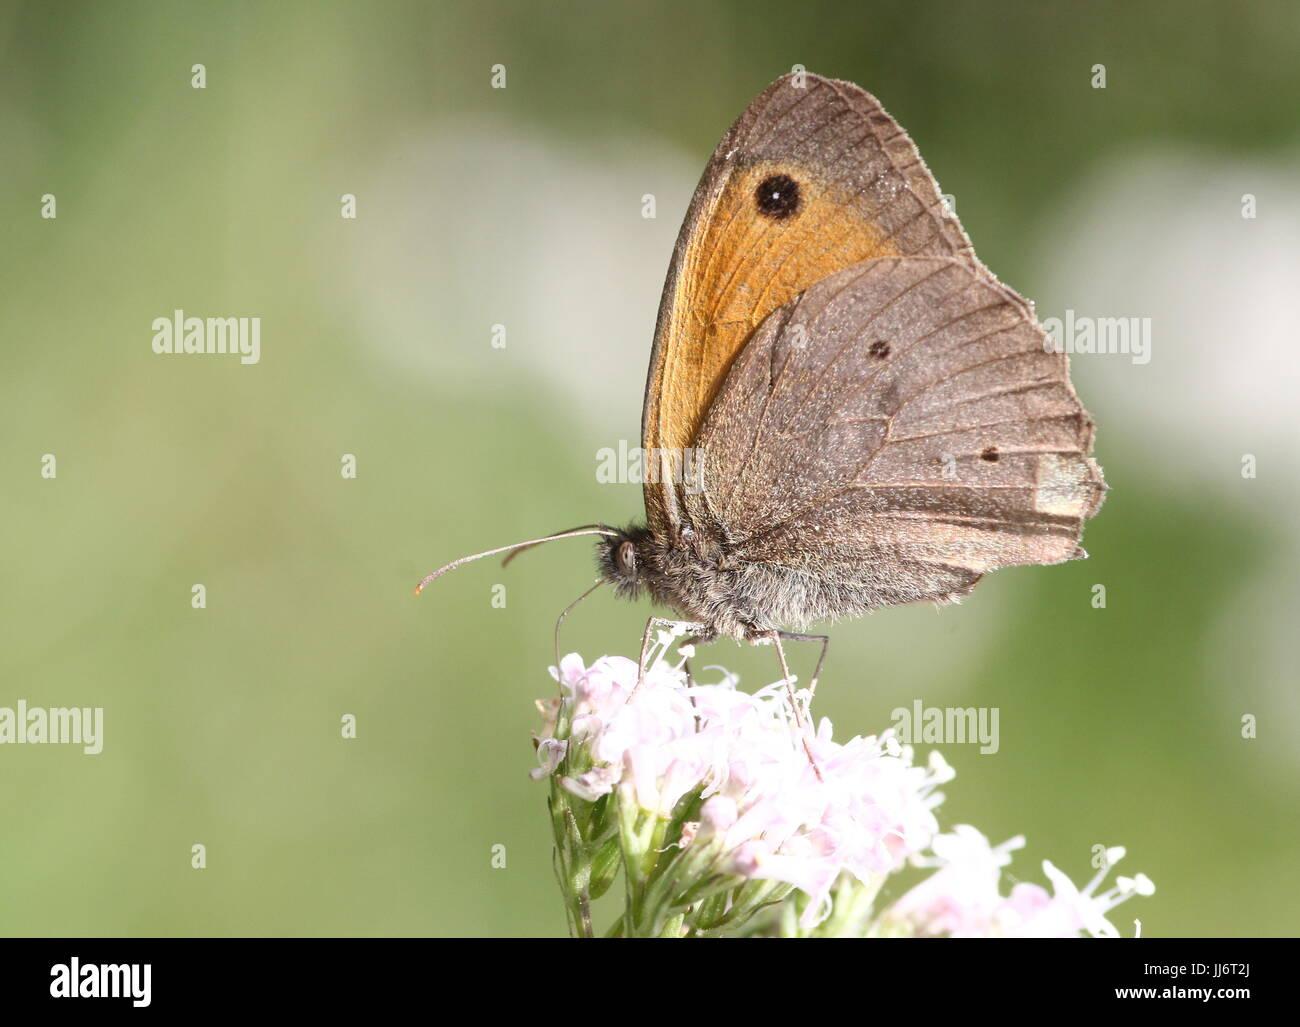 European Meadow Brown butterflies (Maniola jurtina) in closeup while feeding. - Stock Image